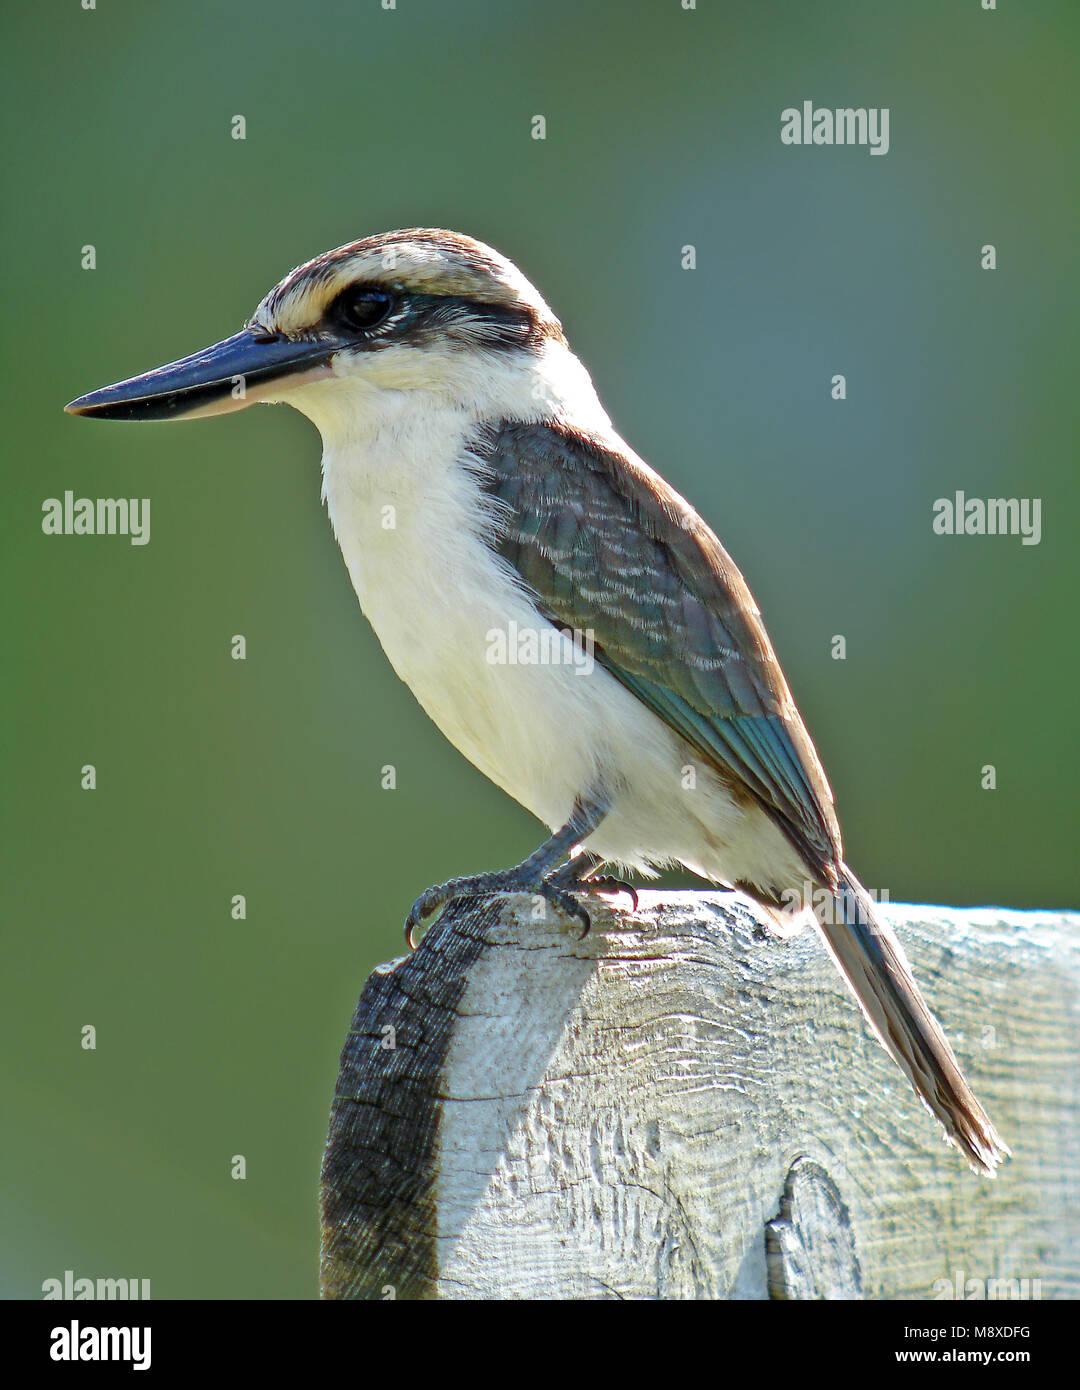 Boraboraijsvogel, Chattering Kingfisher - Stock Image